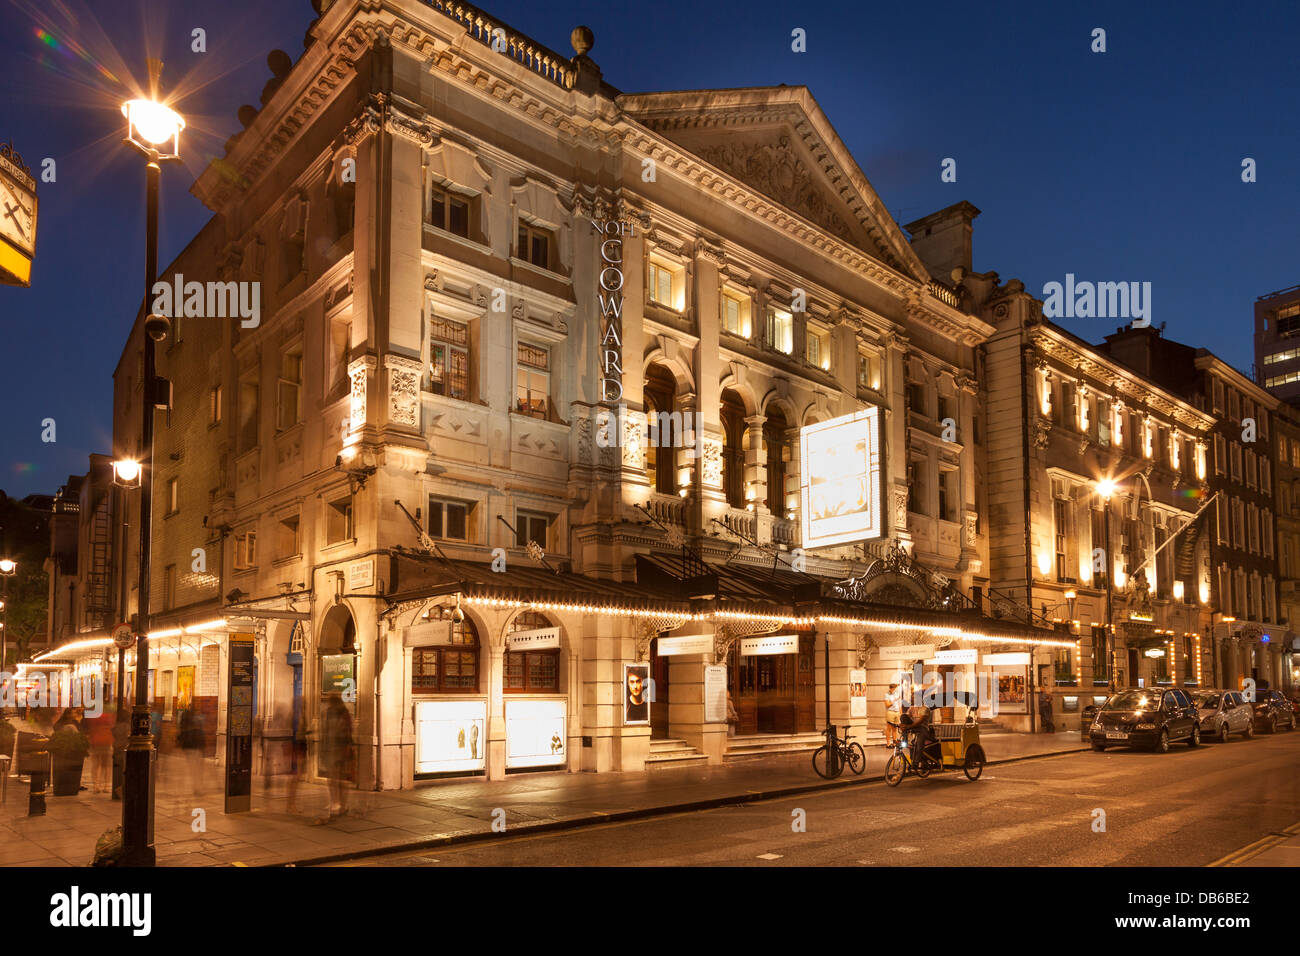 'Noel Coward Theatre' dans la nuit,St.Martin's Street, Londres, Angleterre Photo Stock